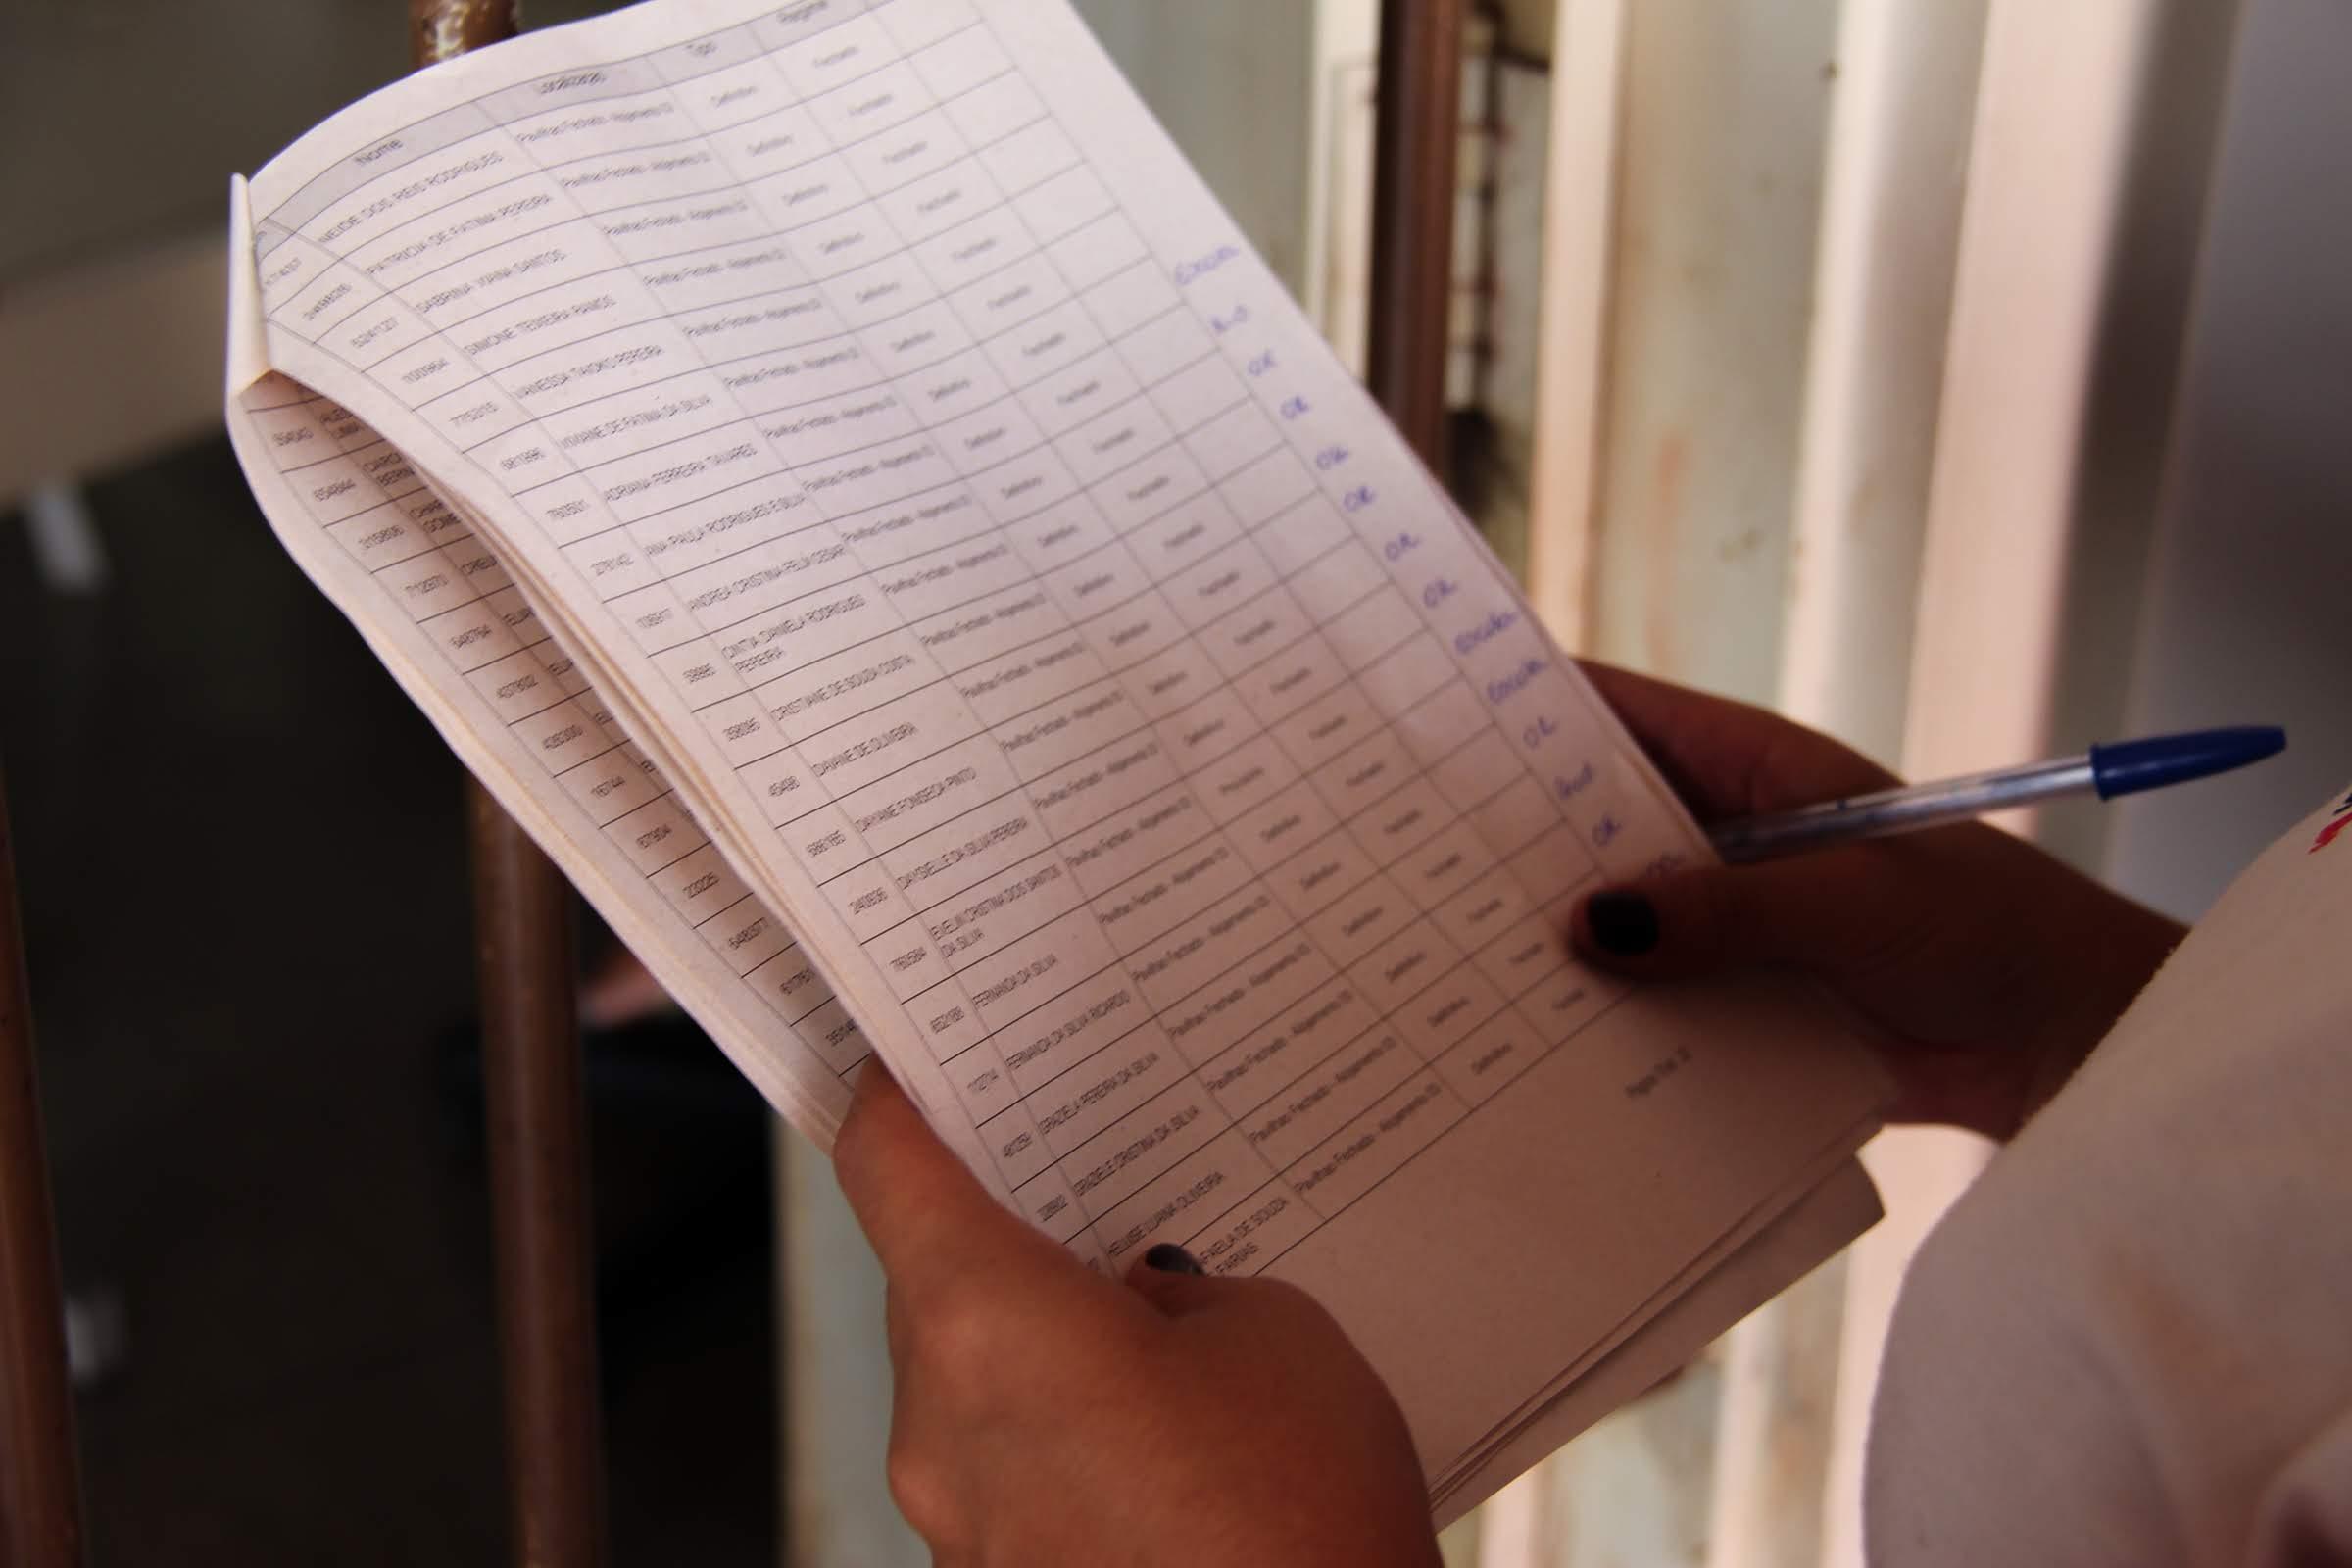 Departamento Penitenciário realiza segundo censo prisional nesta sexta-feira